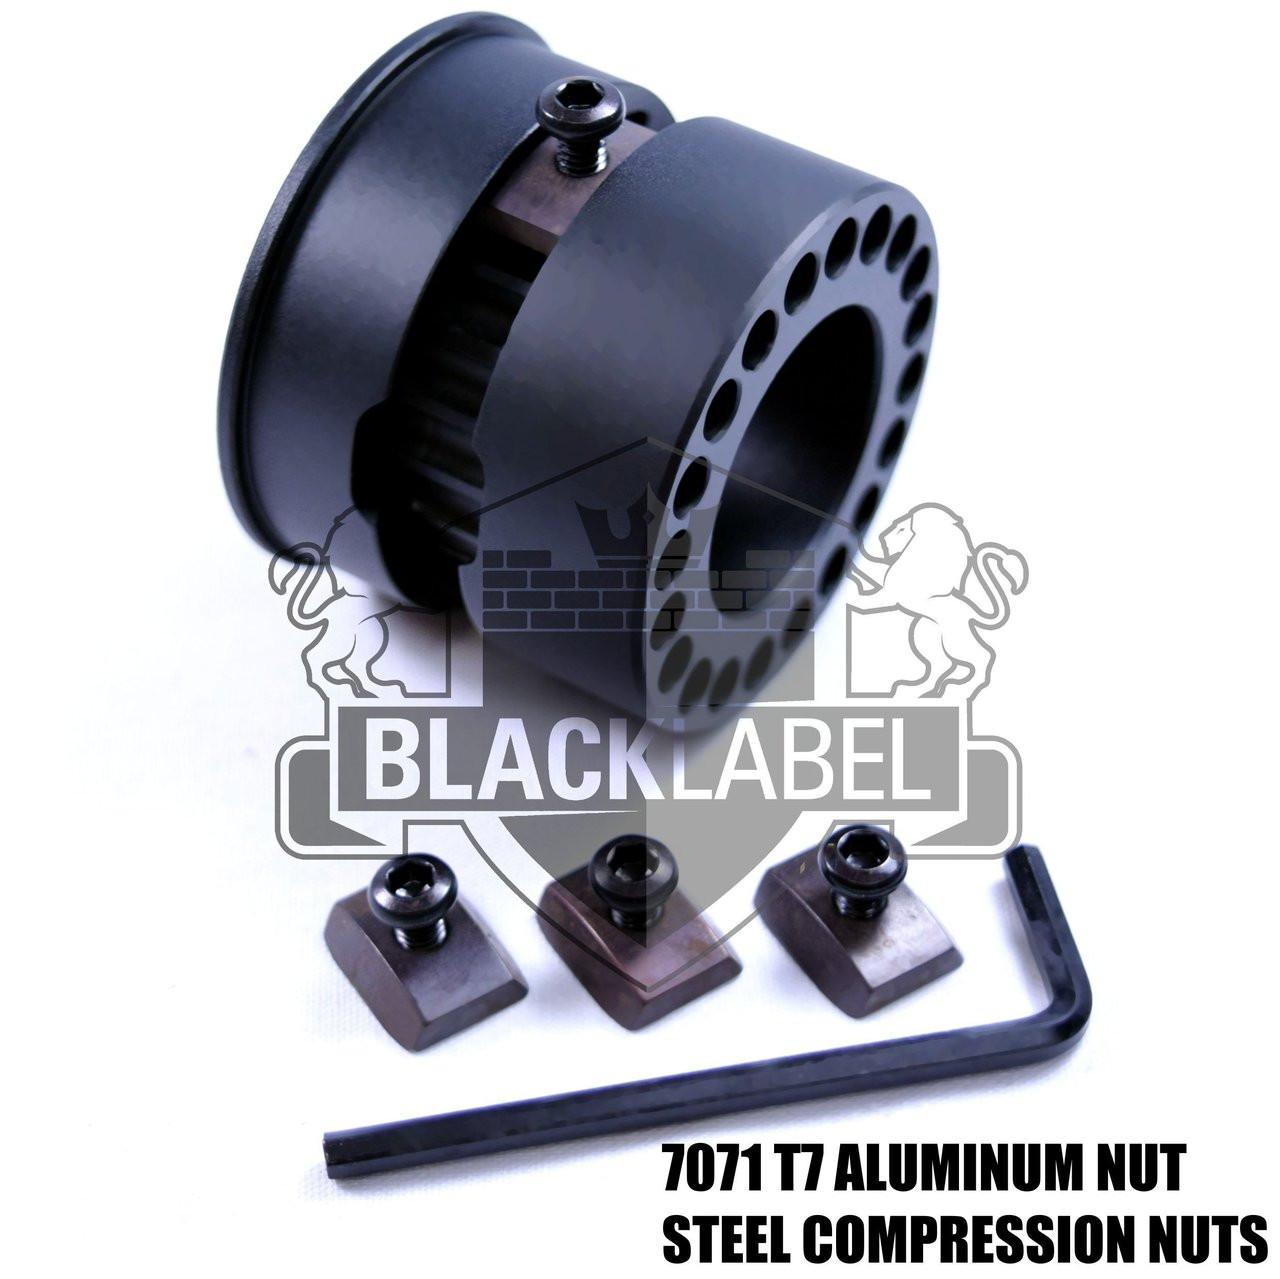 "Black Label Carbon Fiber MLOK | 15"" Free Float M-lok  HandGuard/Quad rail"